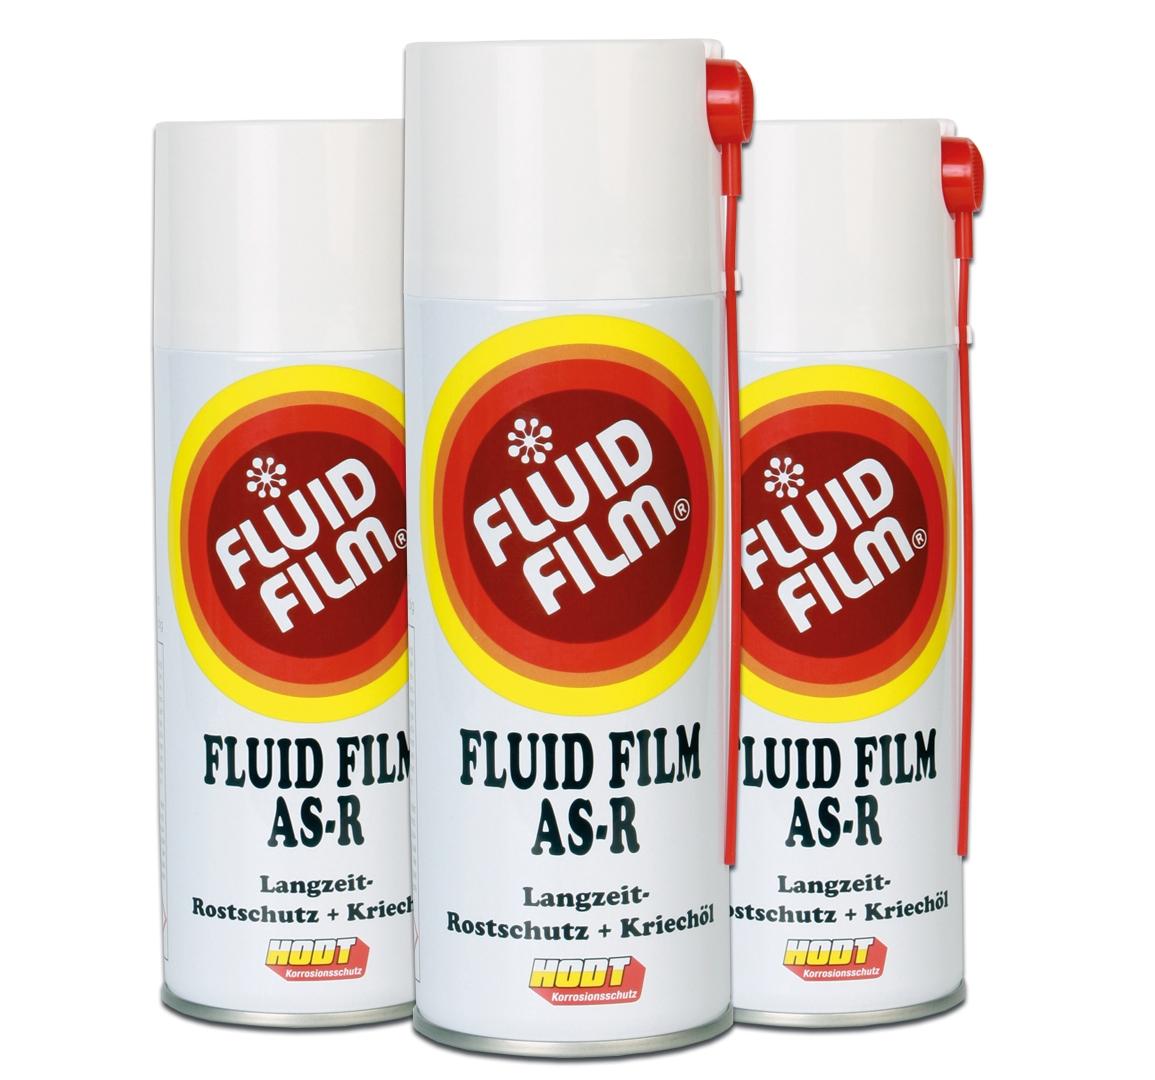 3 x Fluid Film AS-R + holleruimteslang